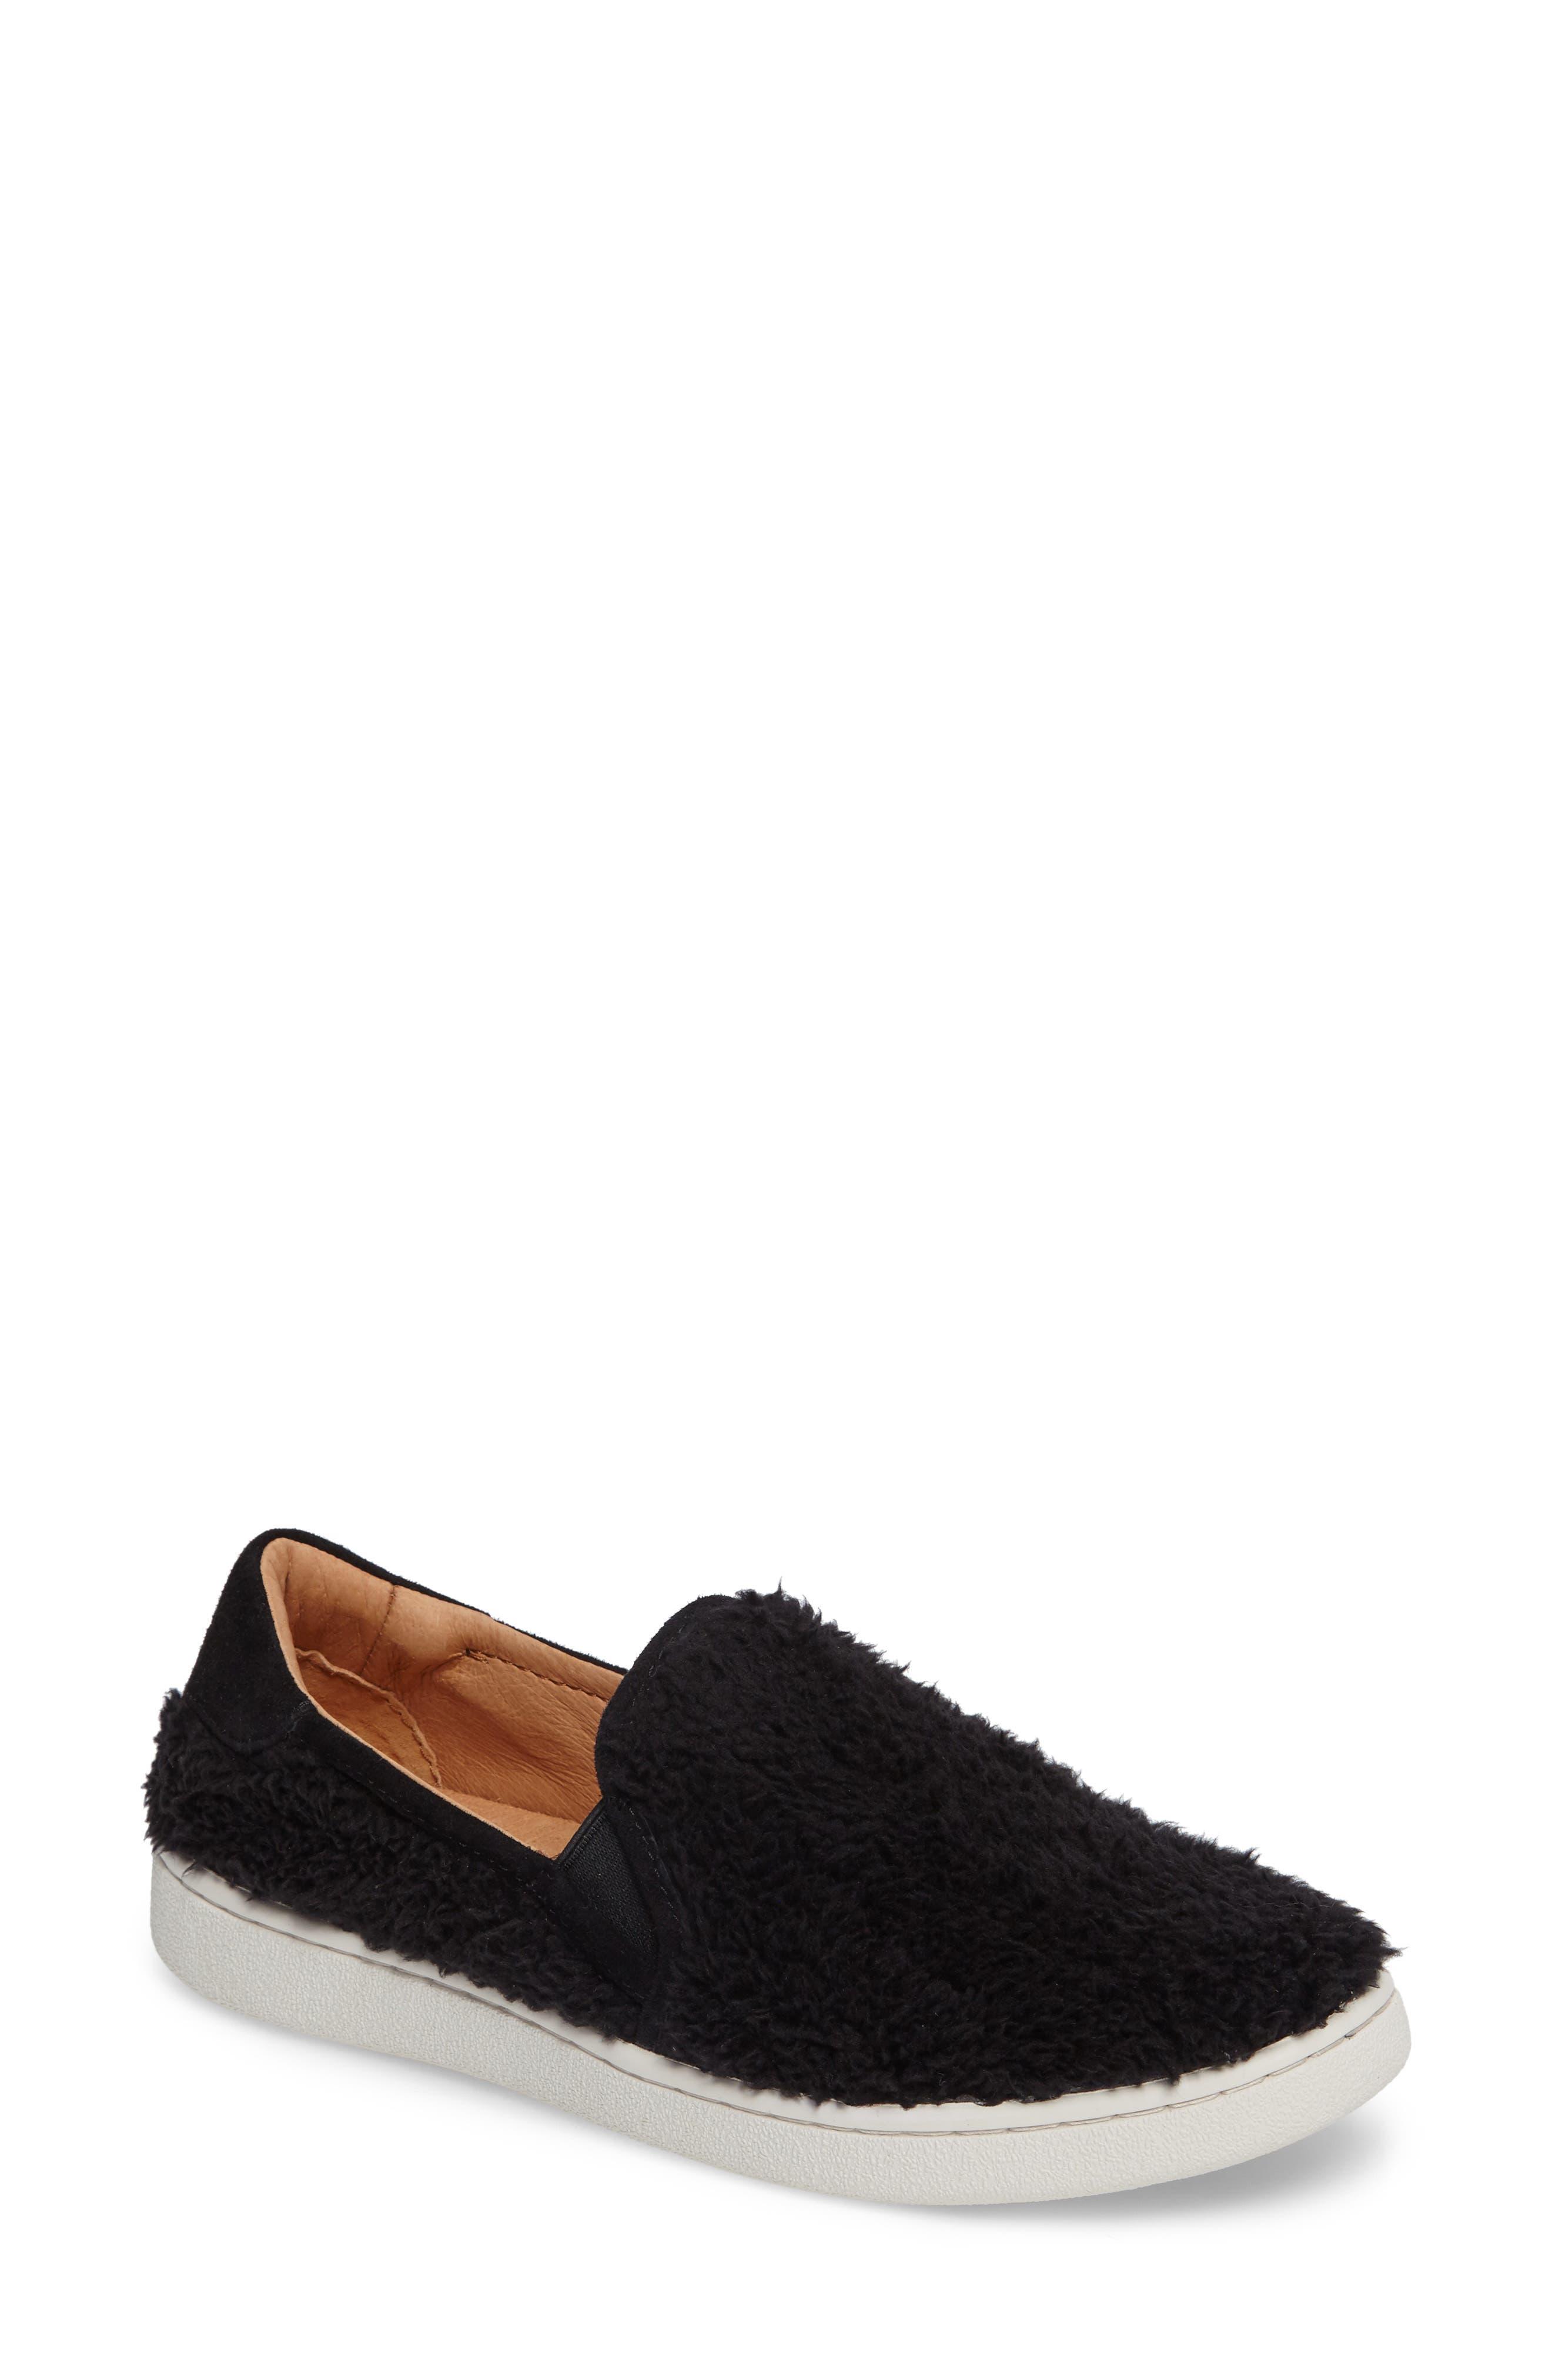 Ricci Plush Slip-On Sneaker,                         Main,                         color, Black Fabric